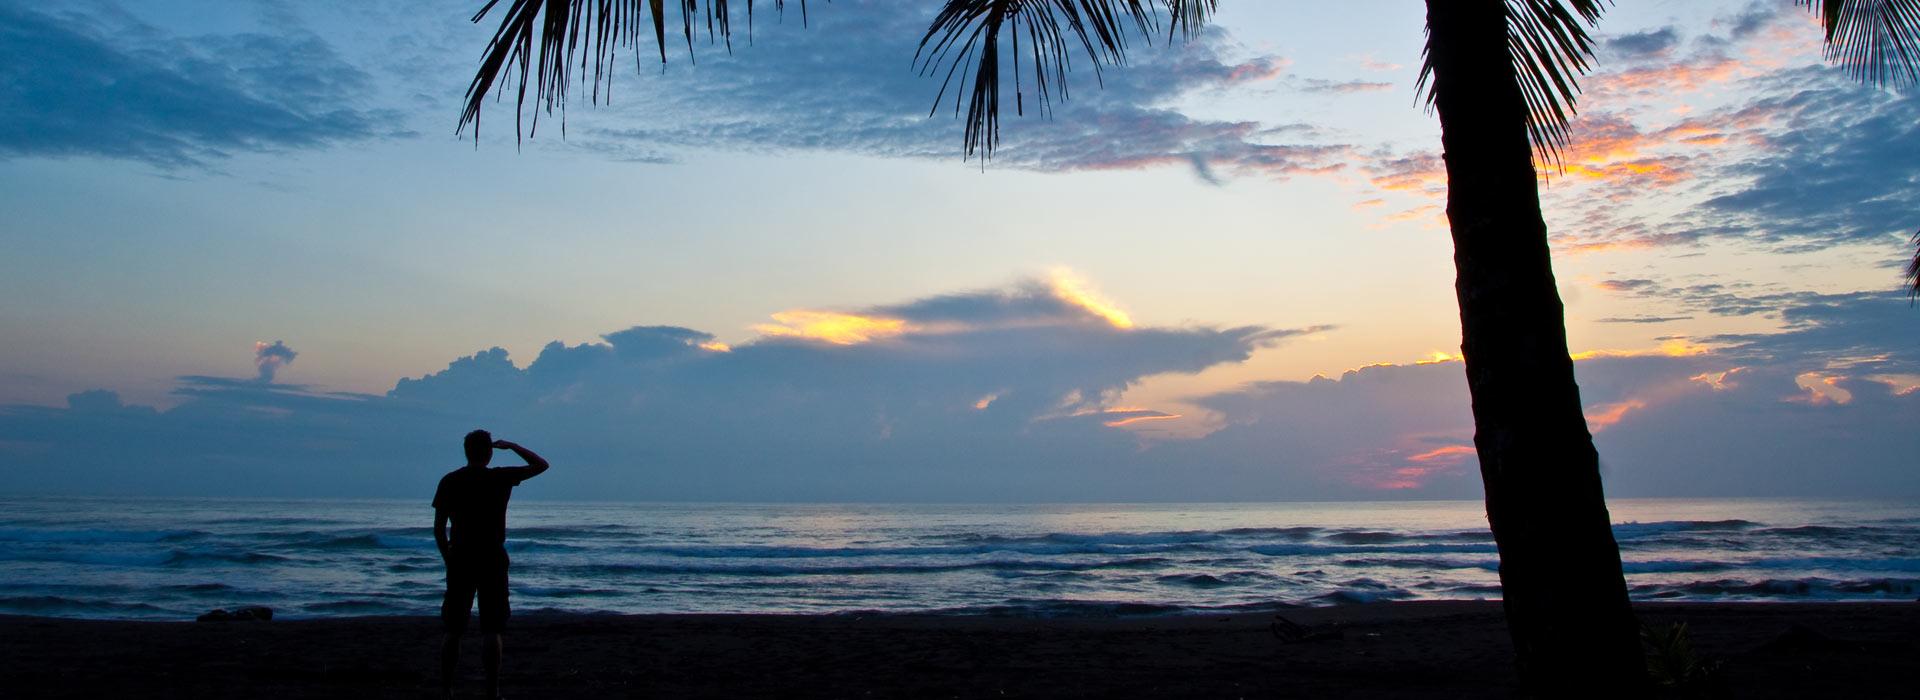 sunset_costa_rica